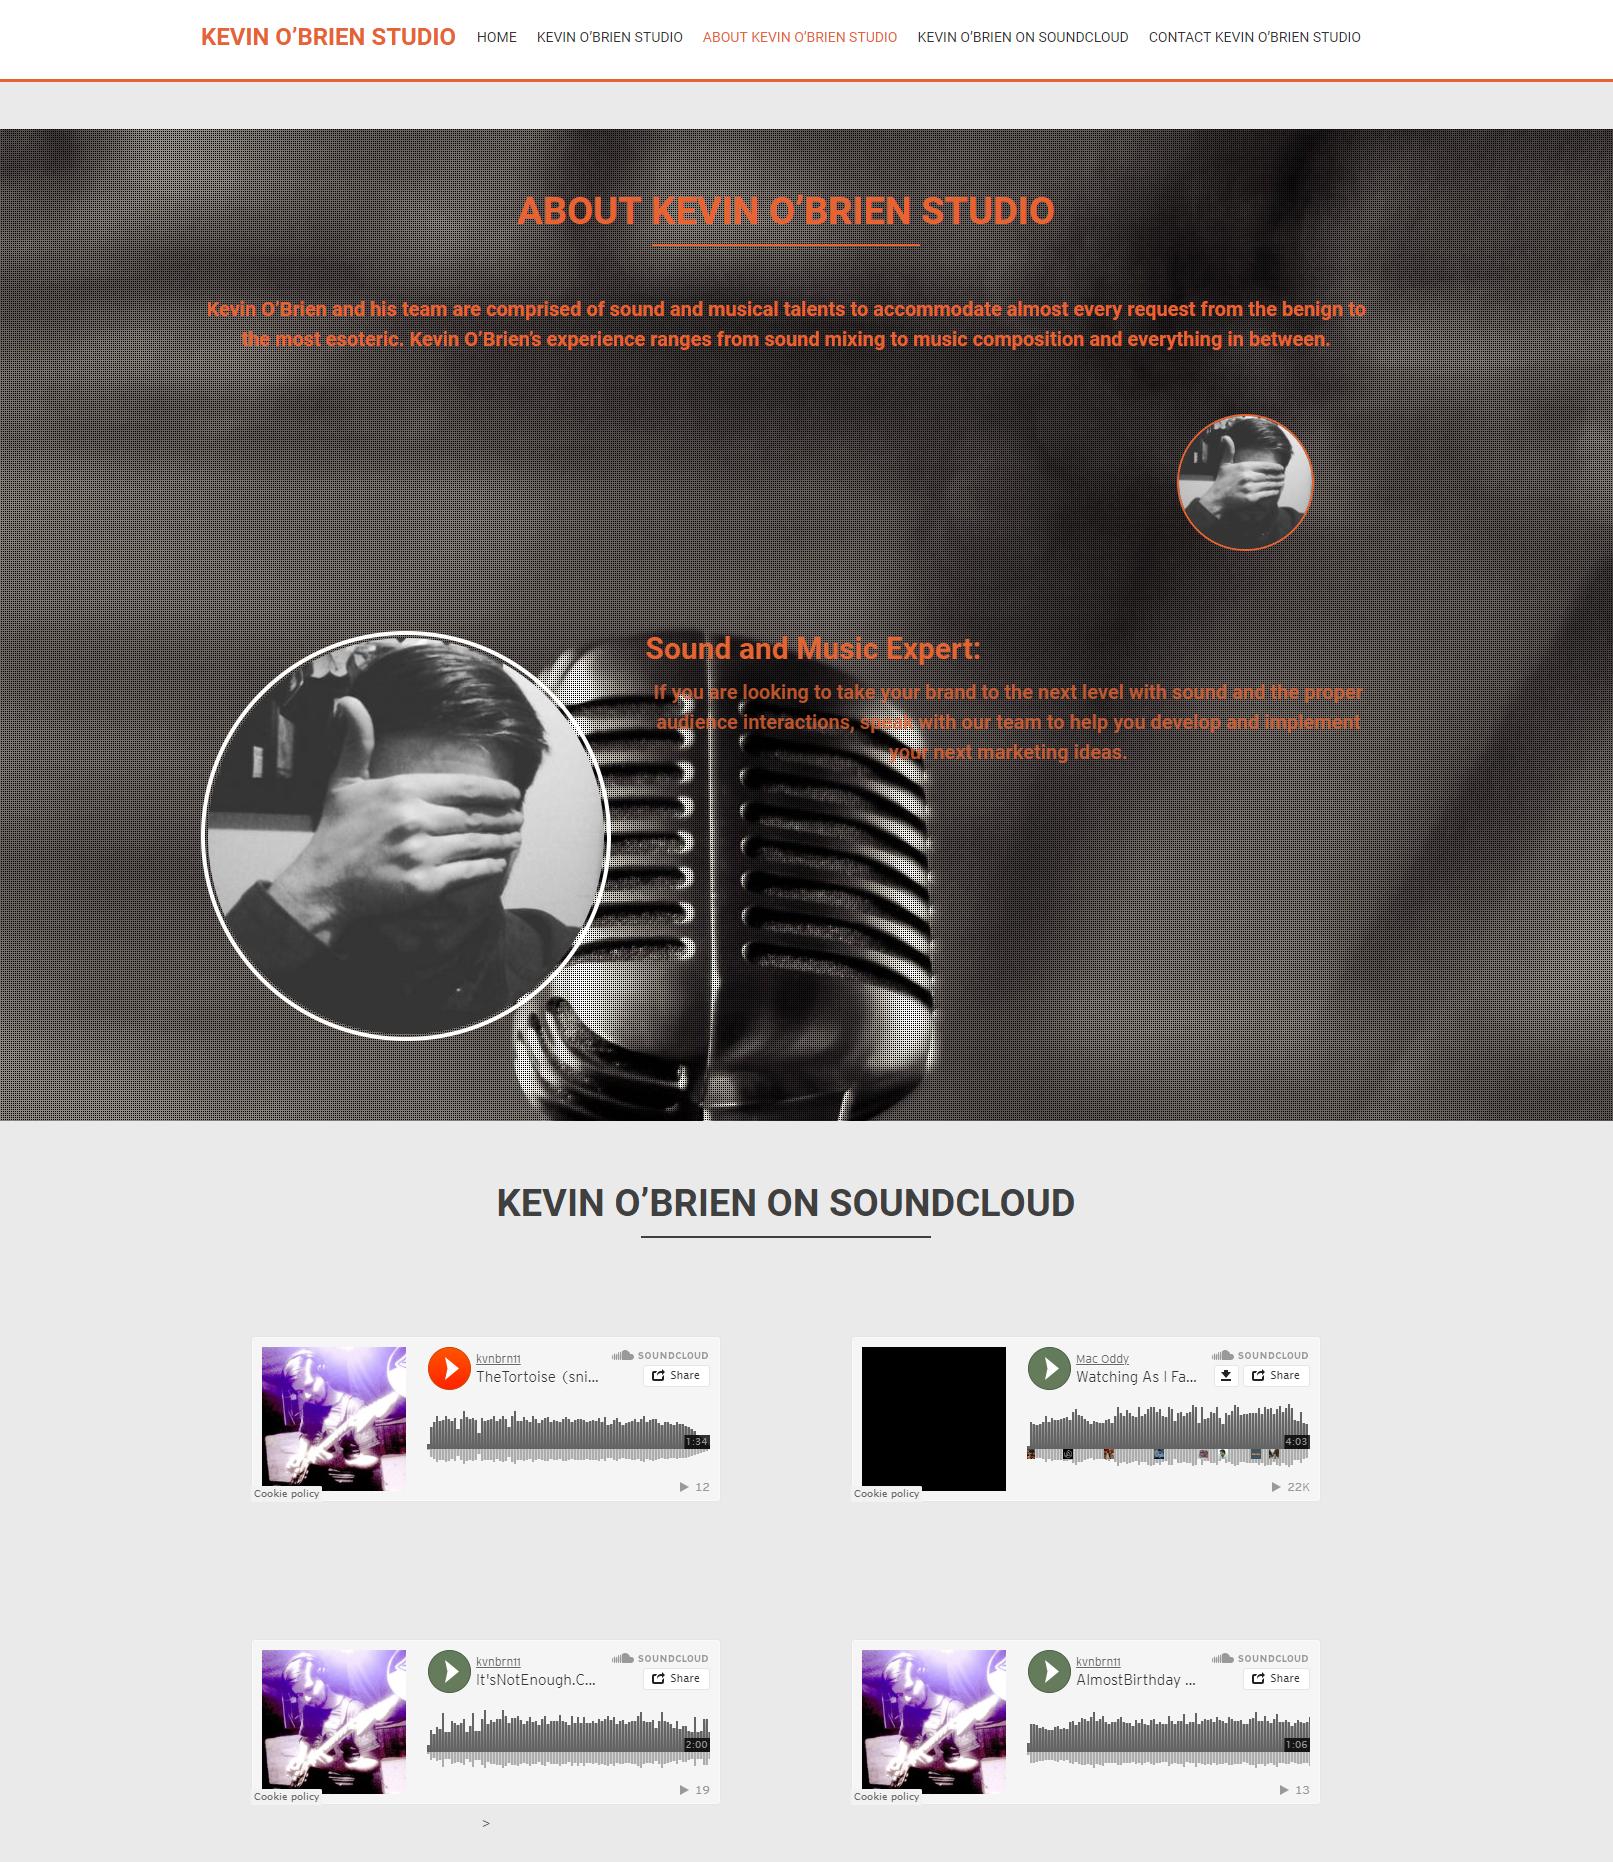 Kevin O'Brien Splash Page SoundCloud Integration and Expert Focus